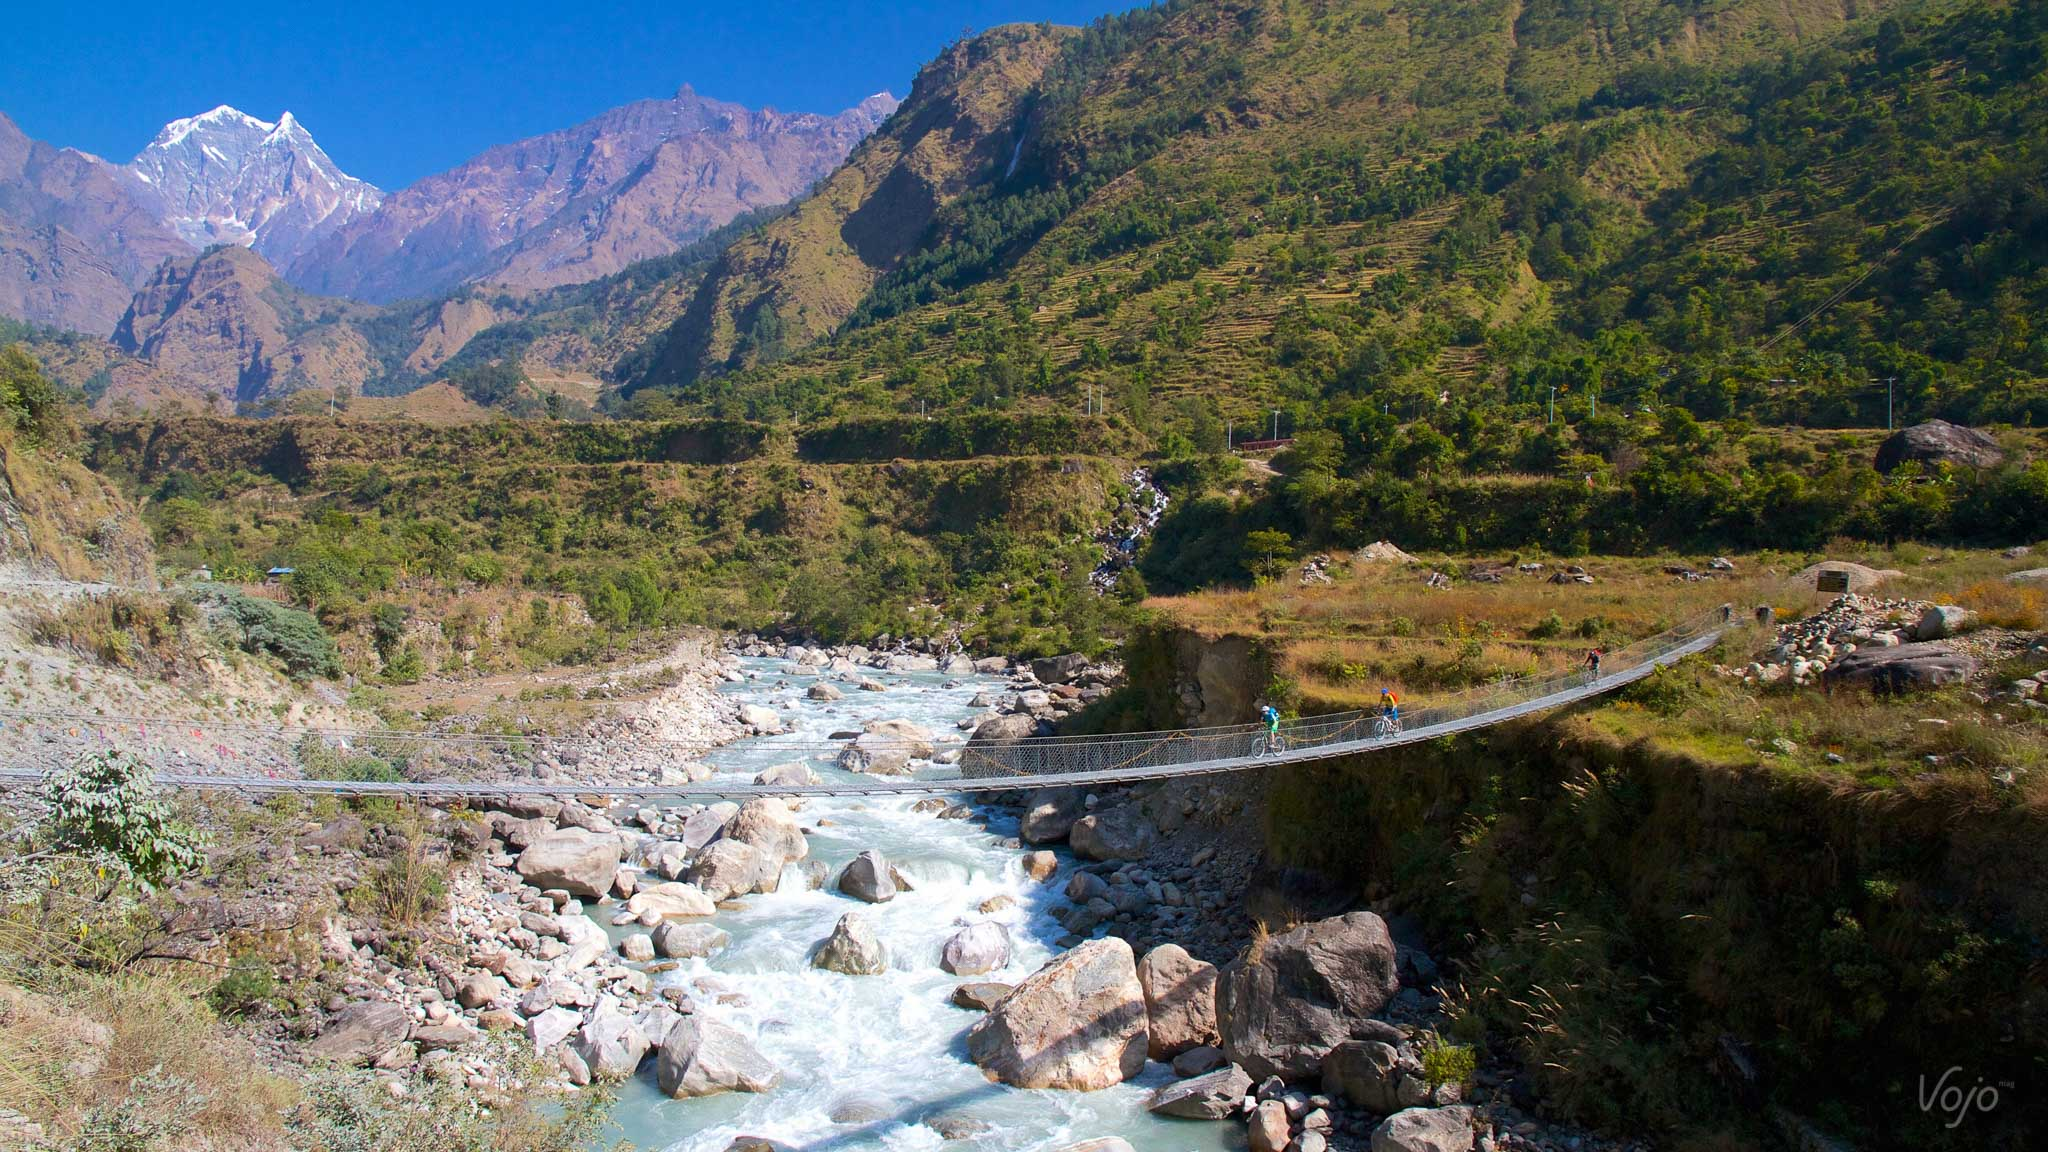 Nepal_Copyright_Molinero_VojoMag-11